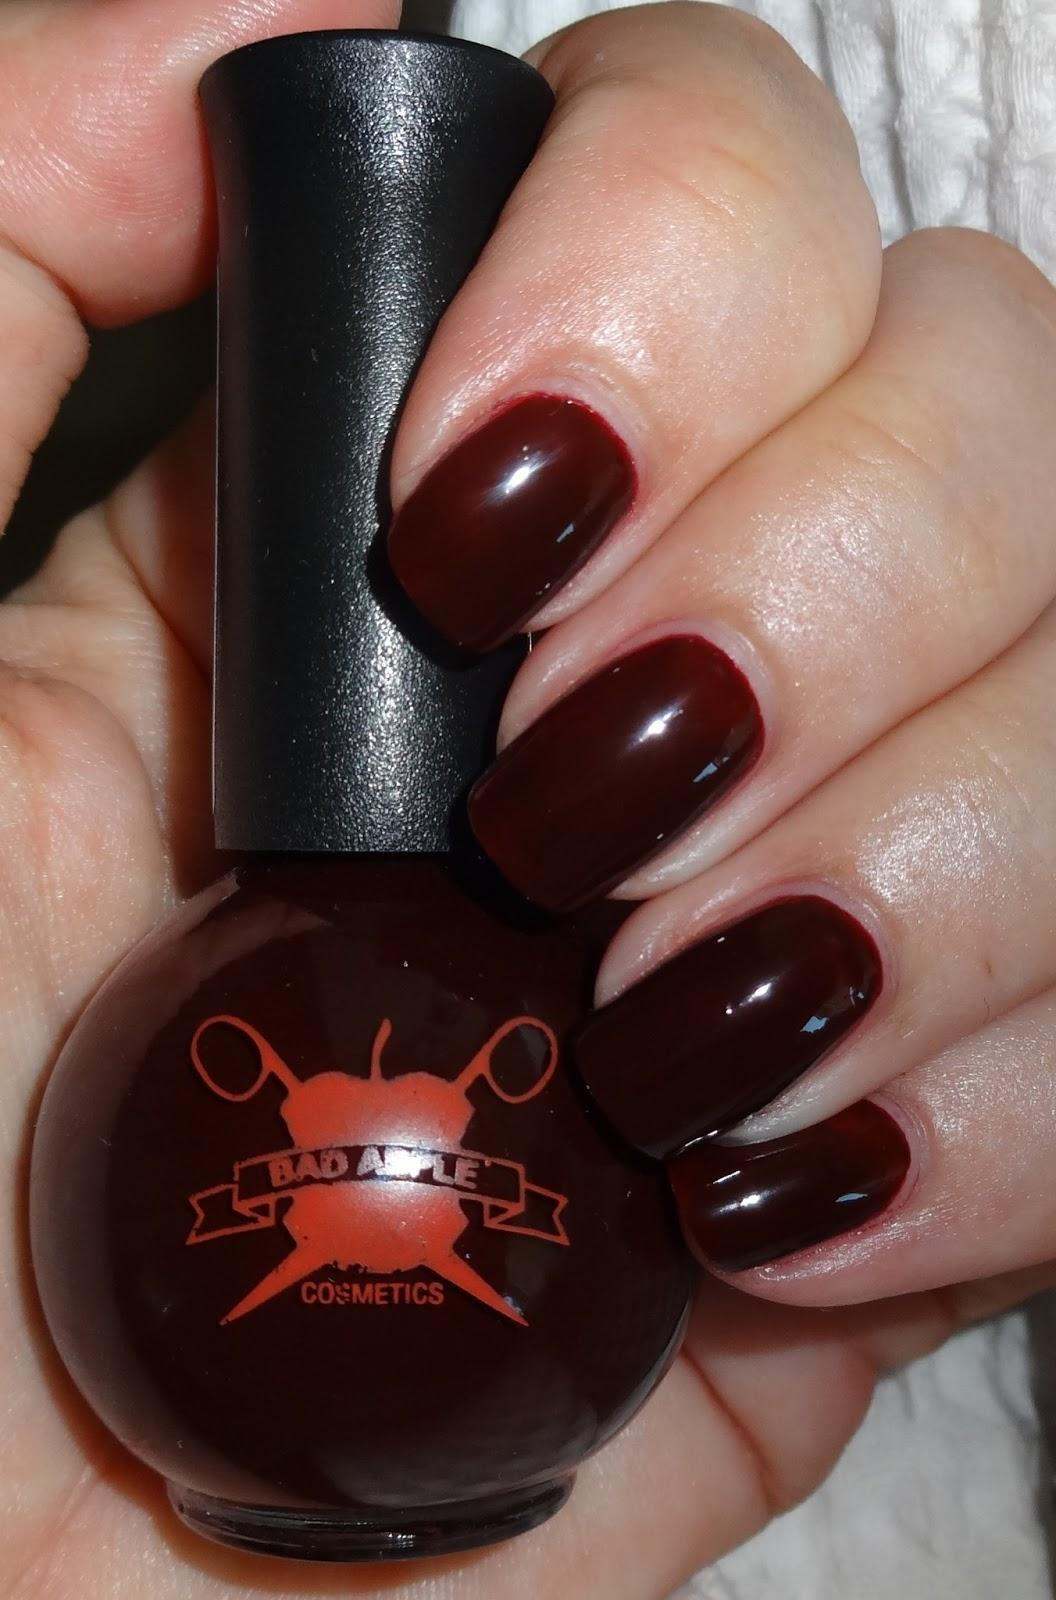 Wendy S Delights Bad Apple Cosmetics Nail Polish Review Akane